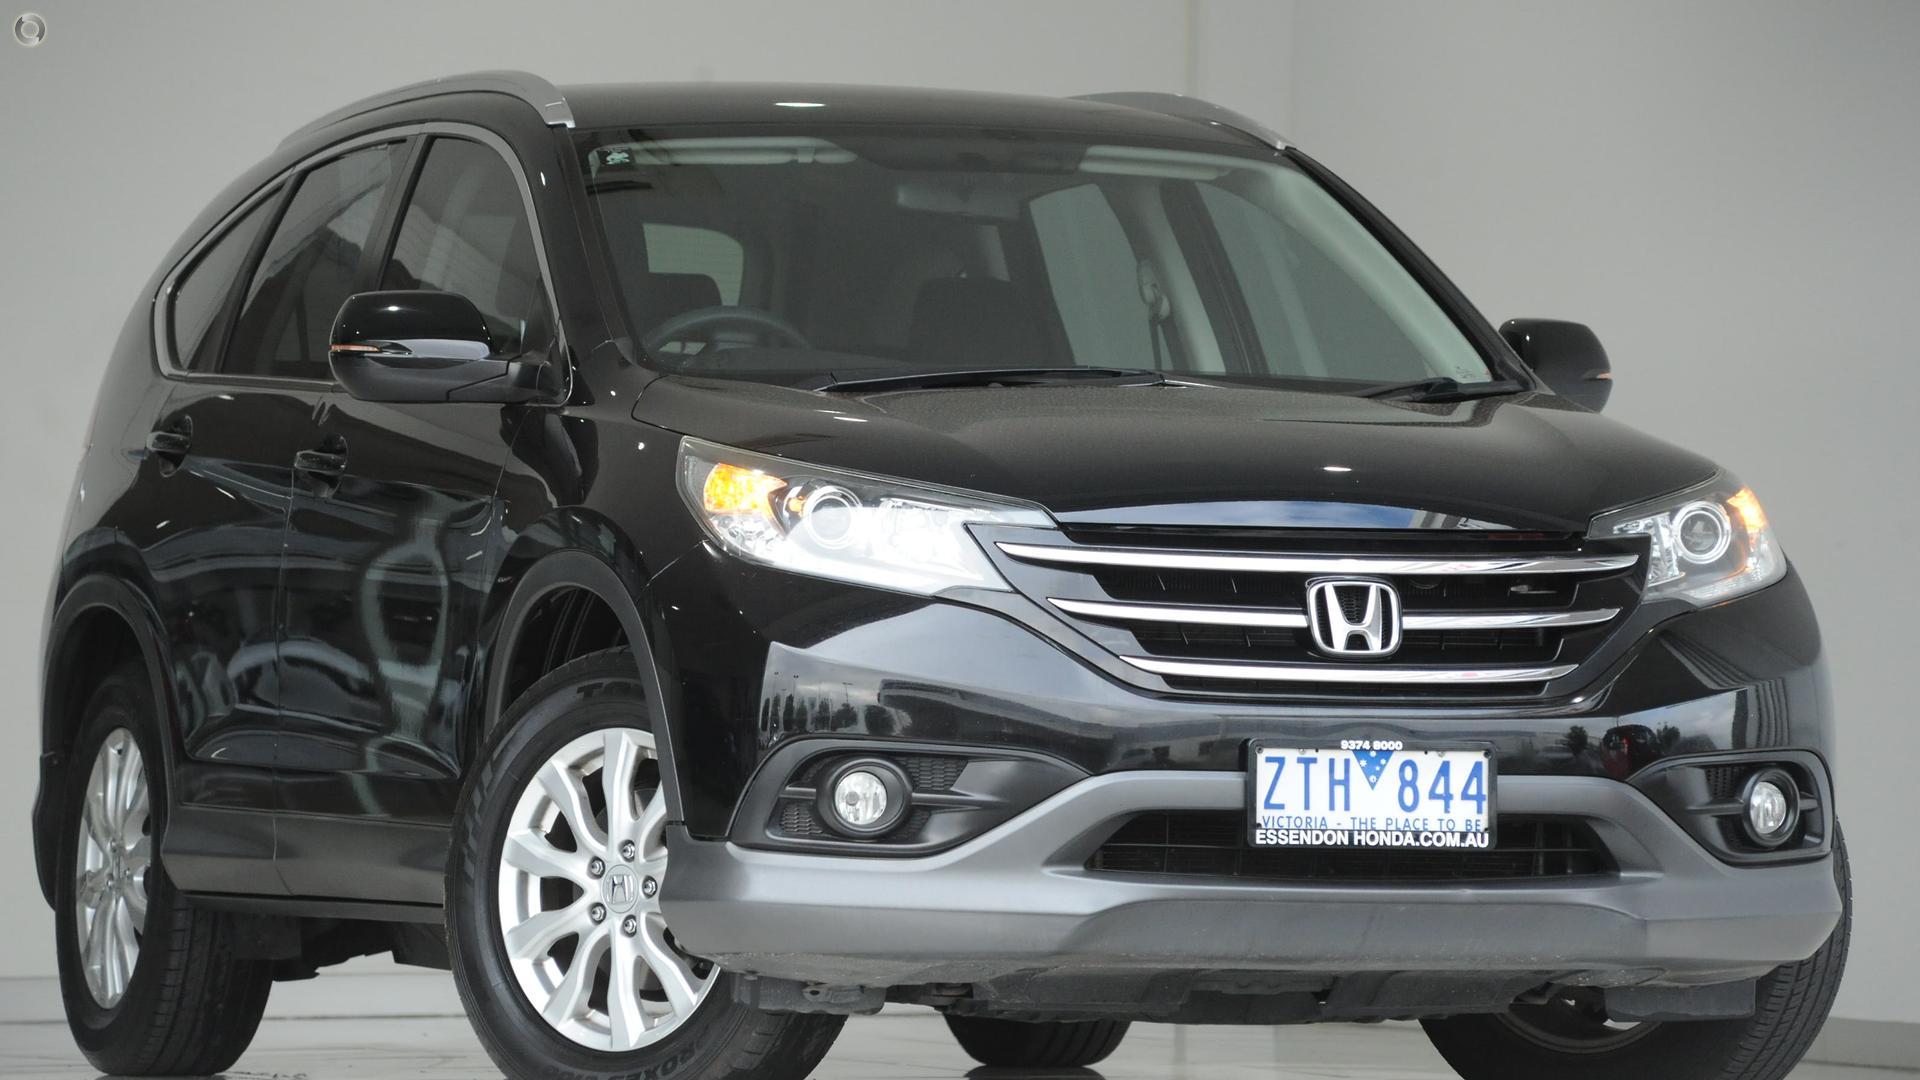 2013 Honda Cr-v RM